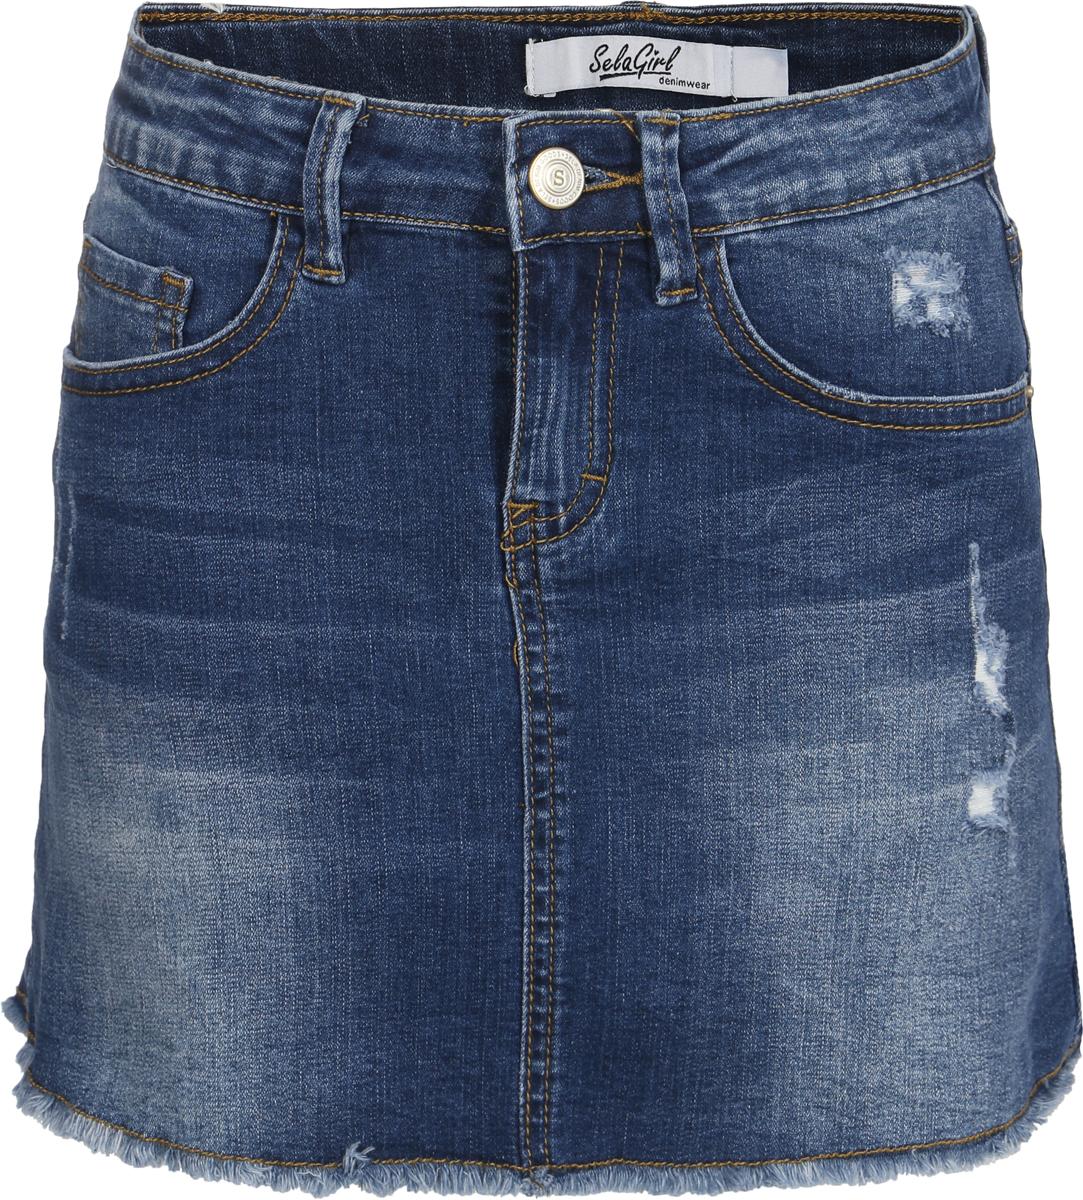 Юбка для девочки Sela, цвет: синий джинс. SKJ-638/475-8122. Размер 146, 11 лет